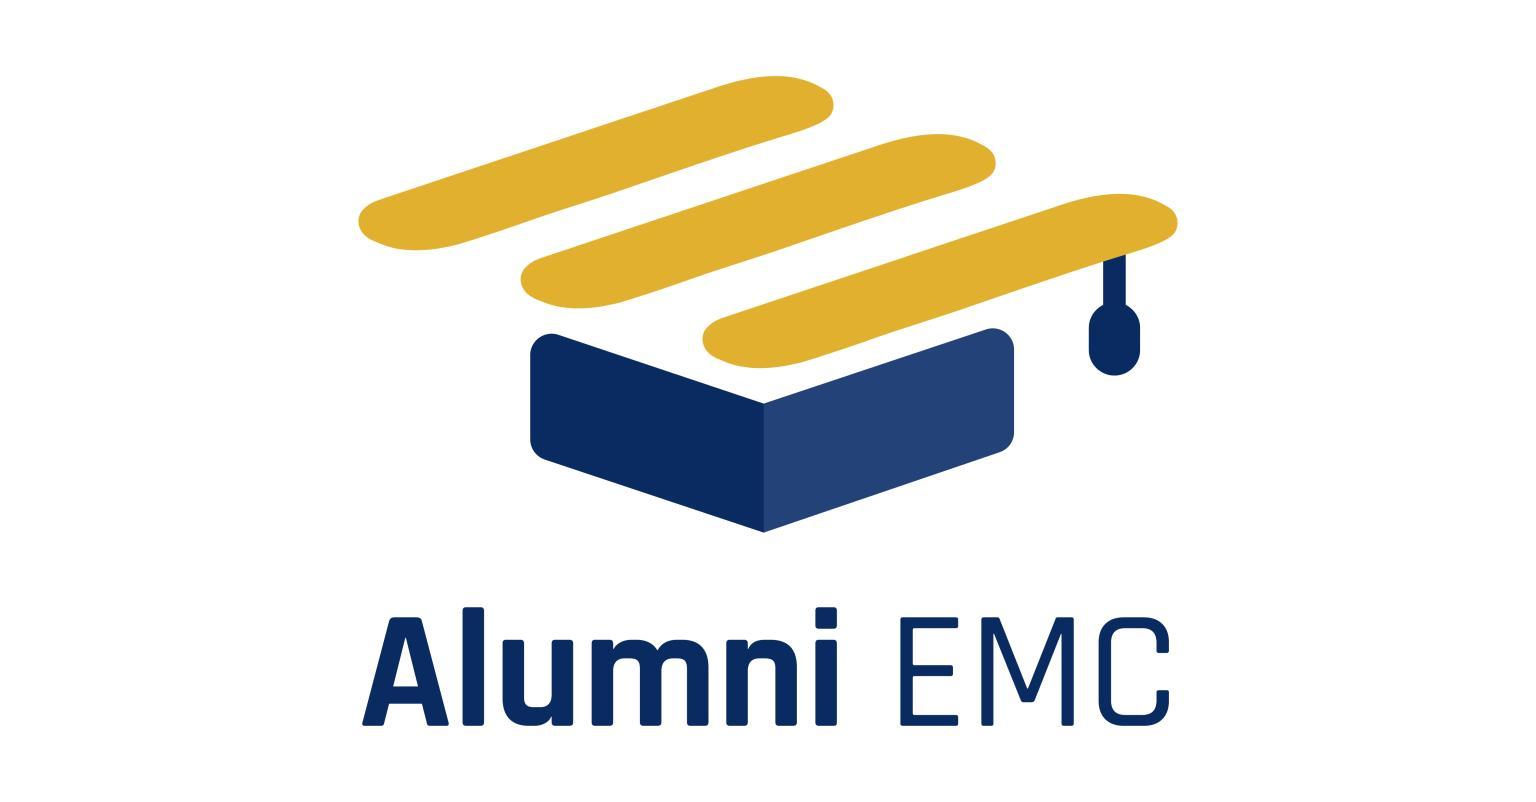 Alumni EMC